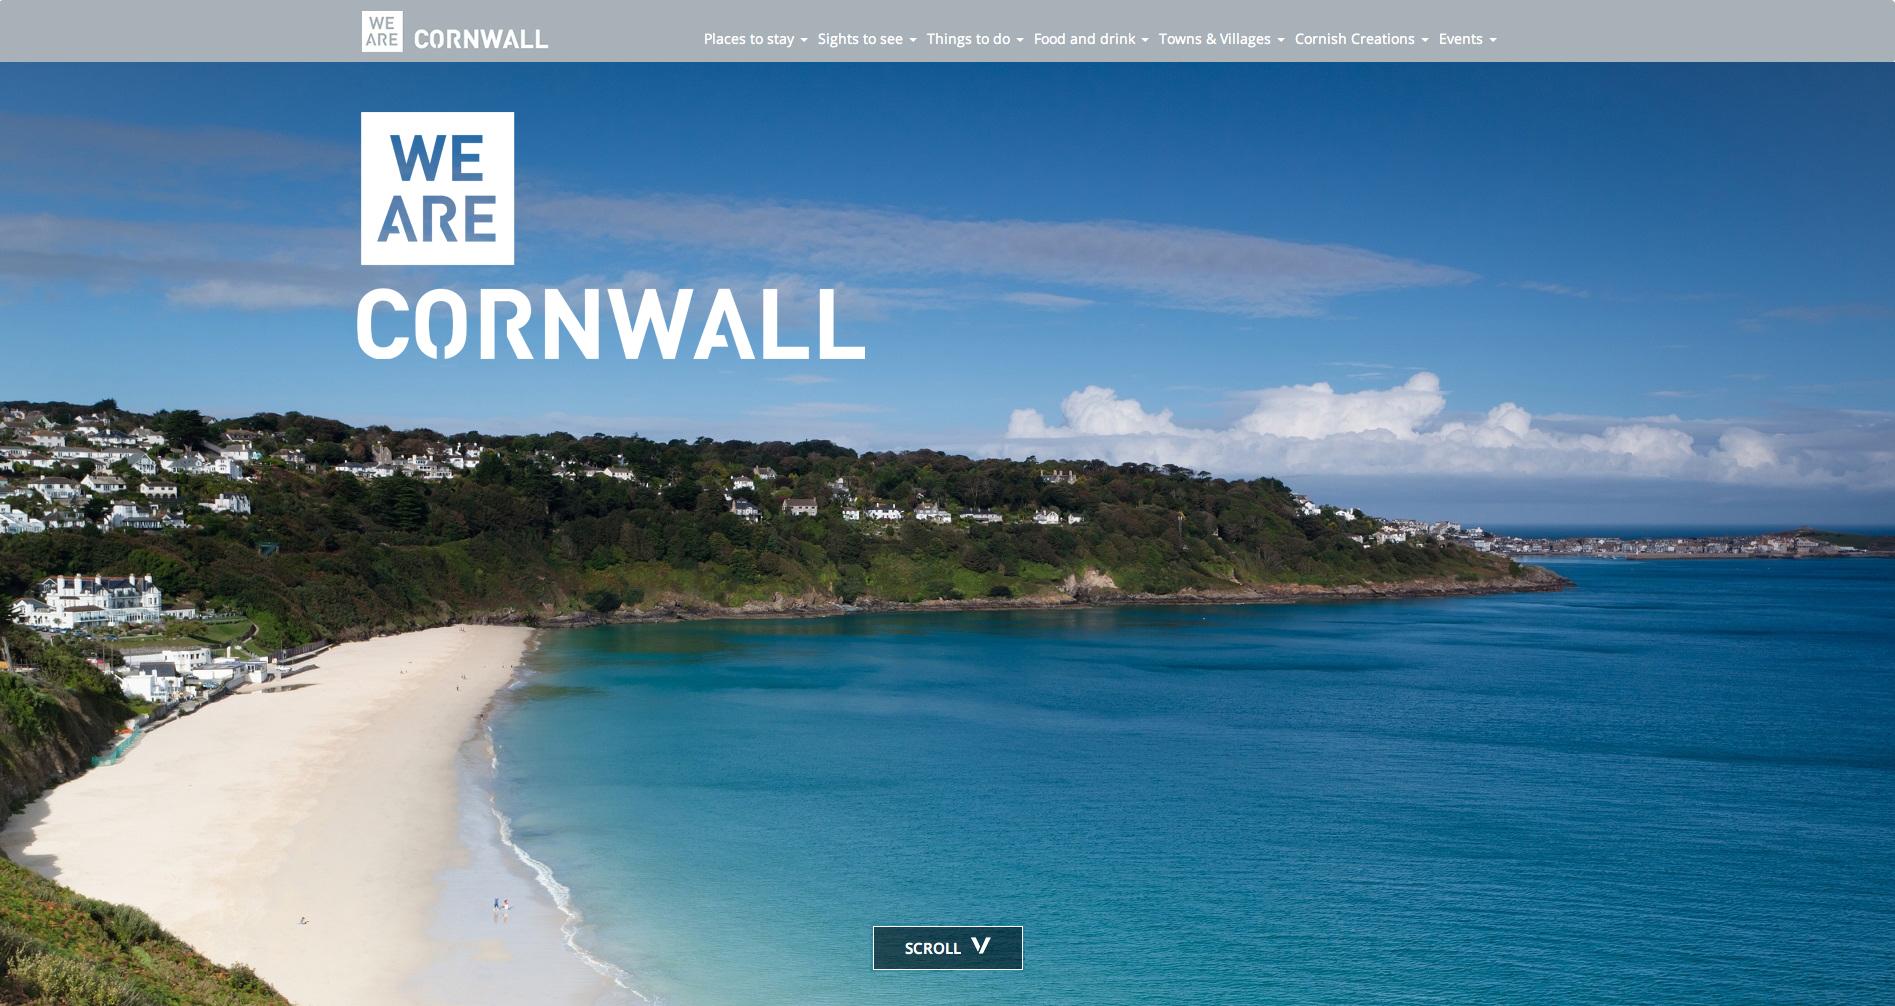 We are Cornwall - C#28AAA73